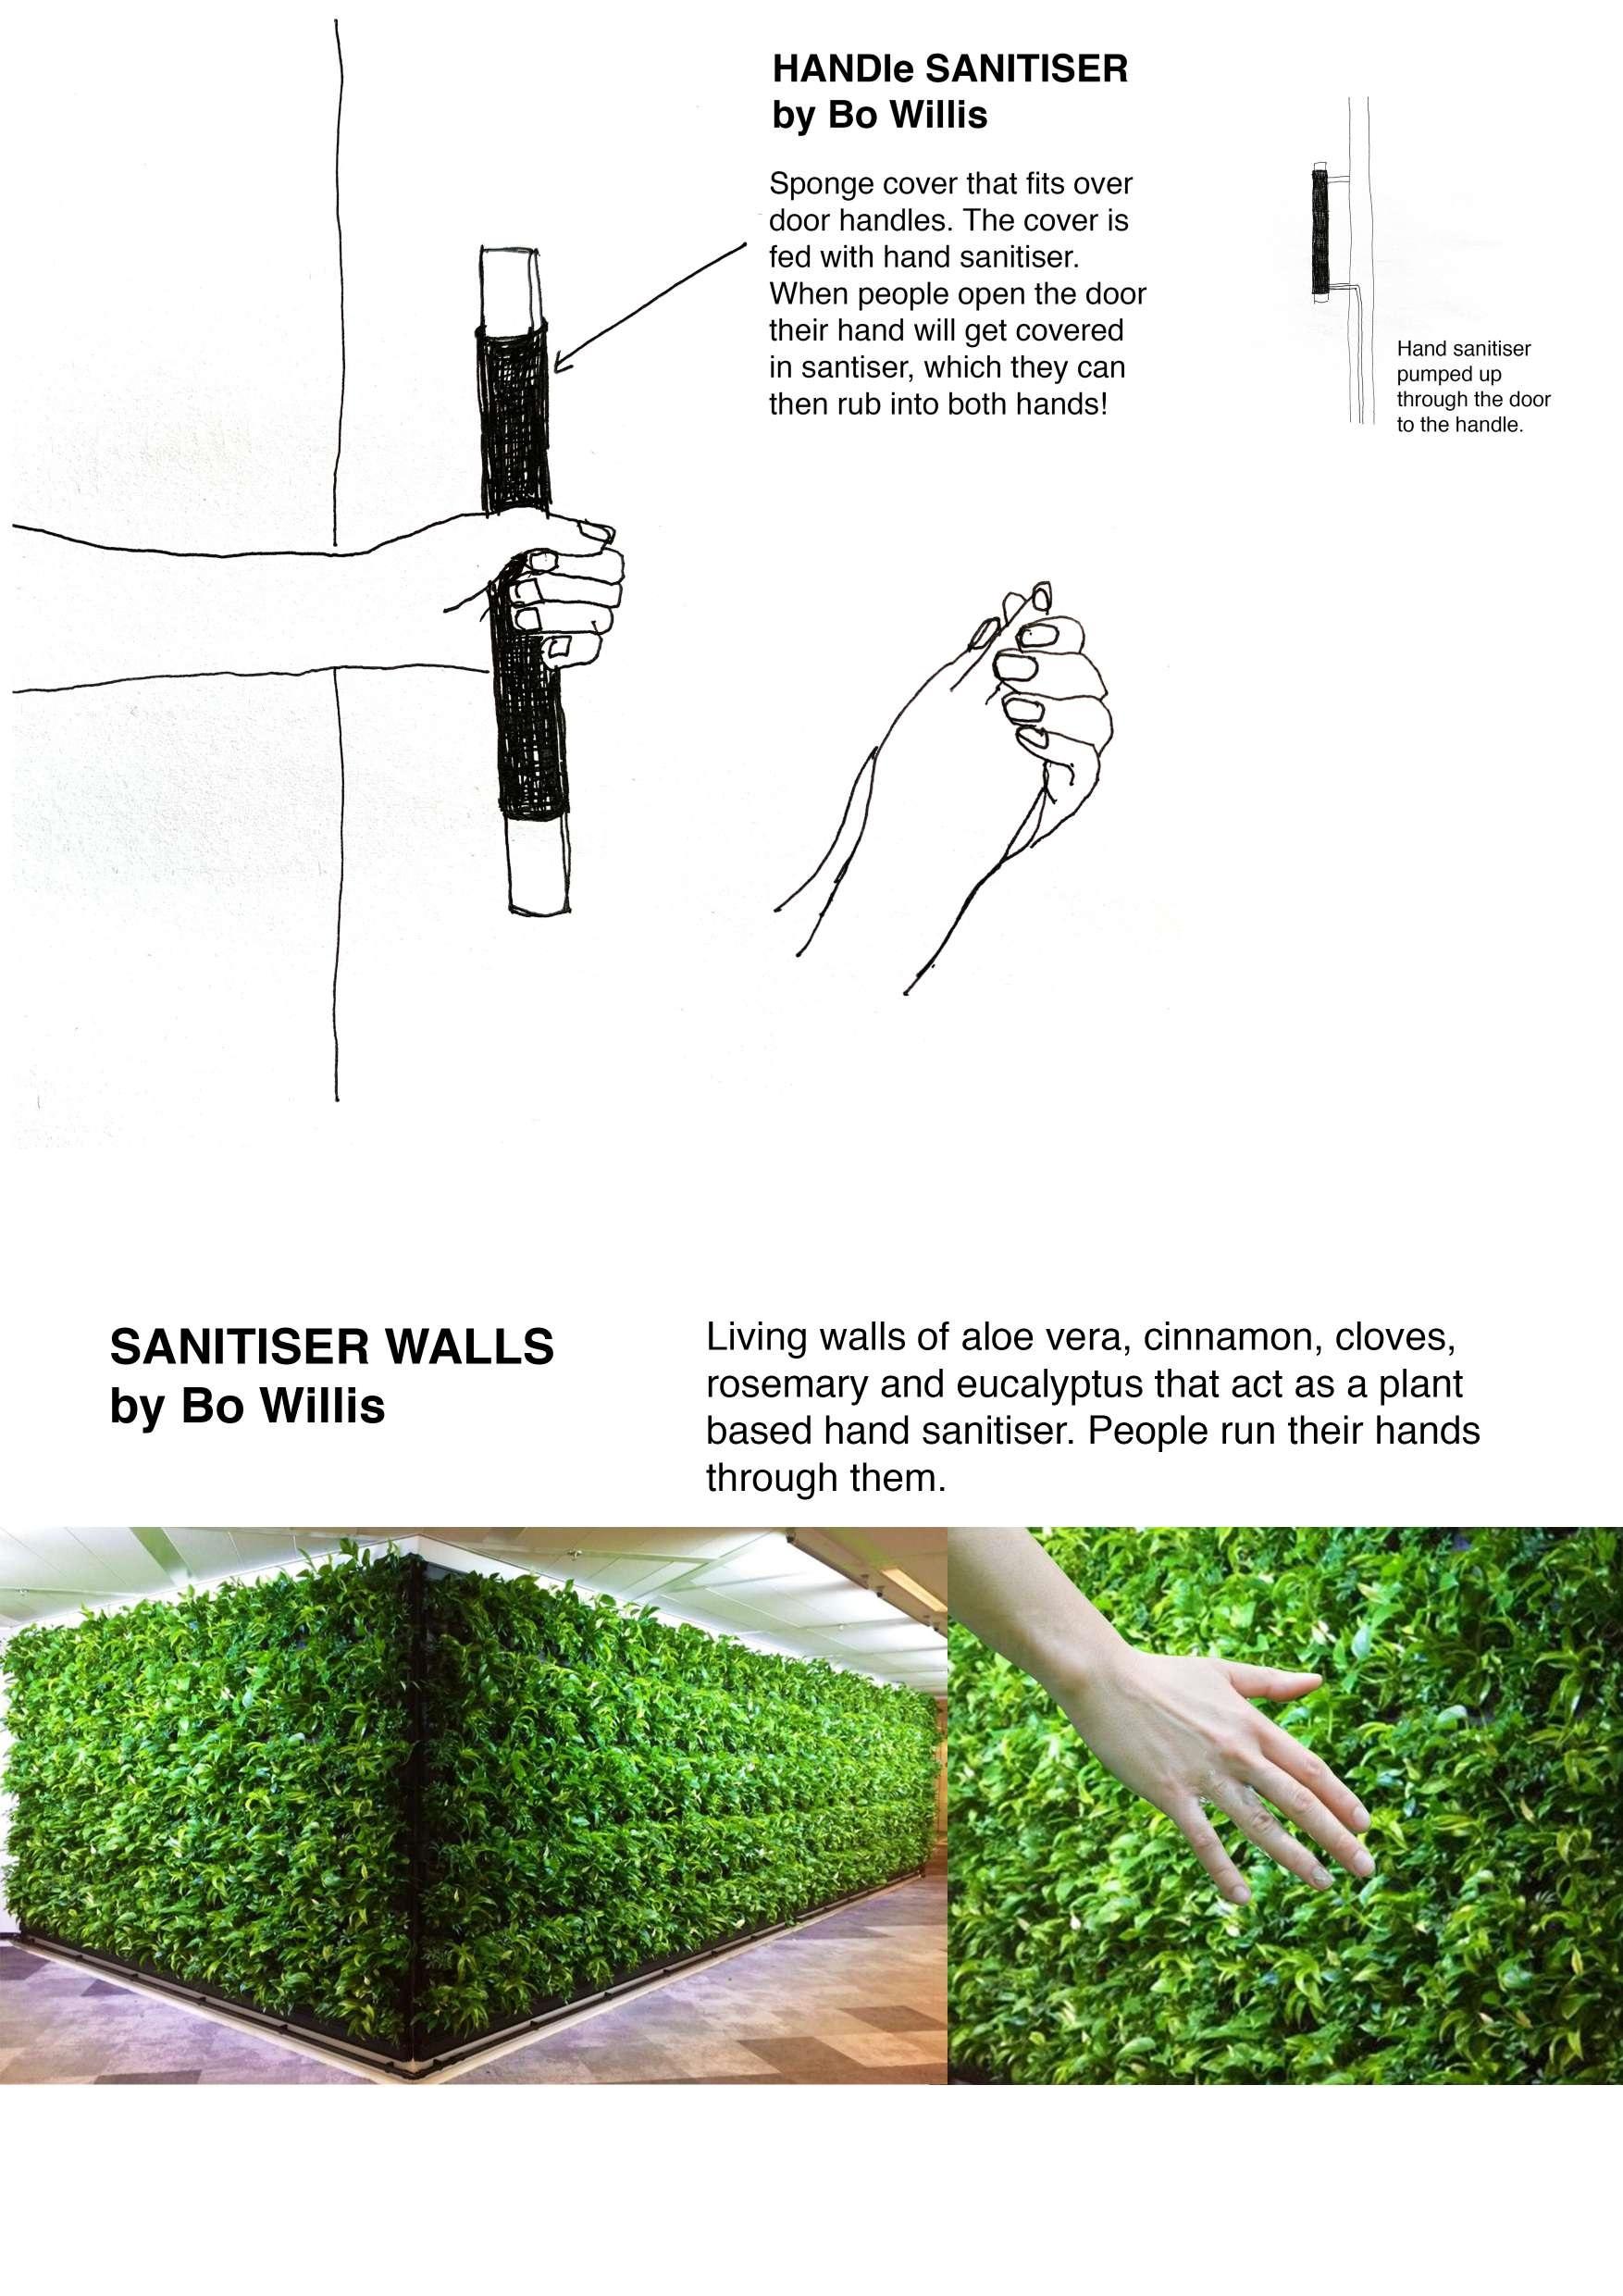 'Handle Sanitiser' and 'Sanitiser Walls' by Bo Willis